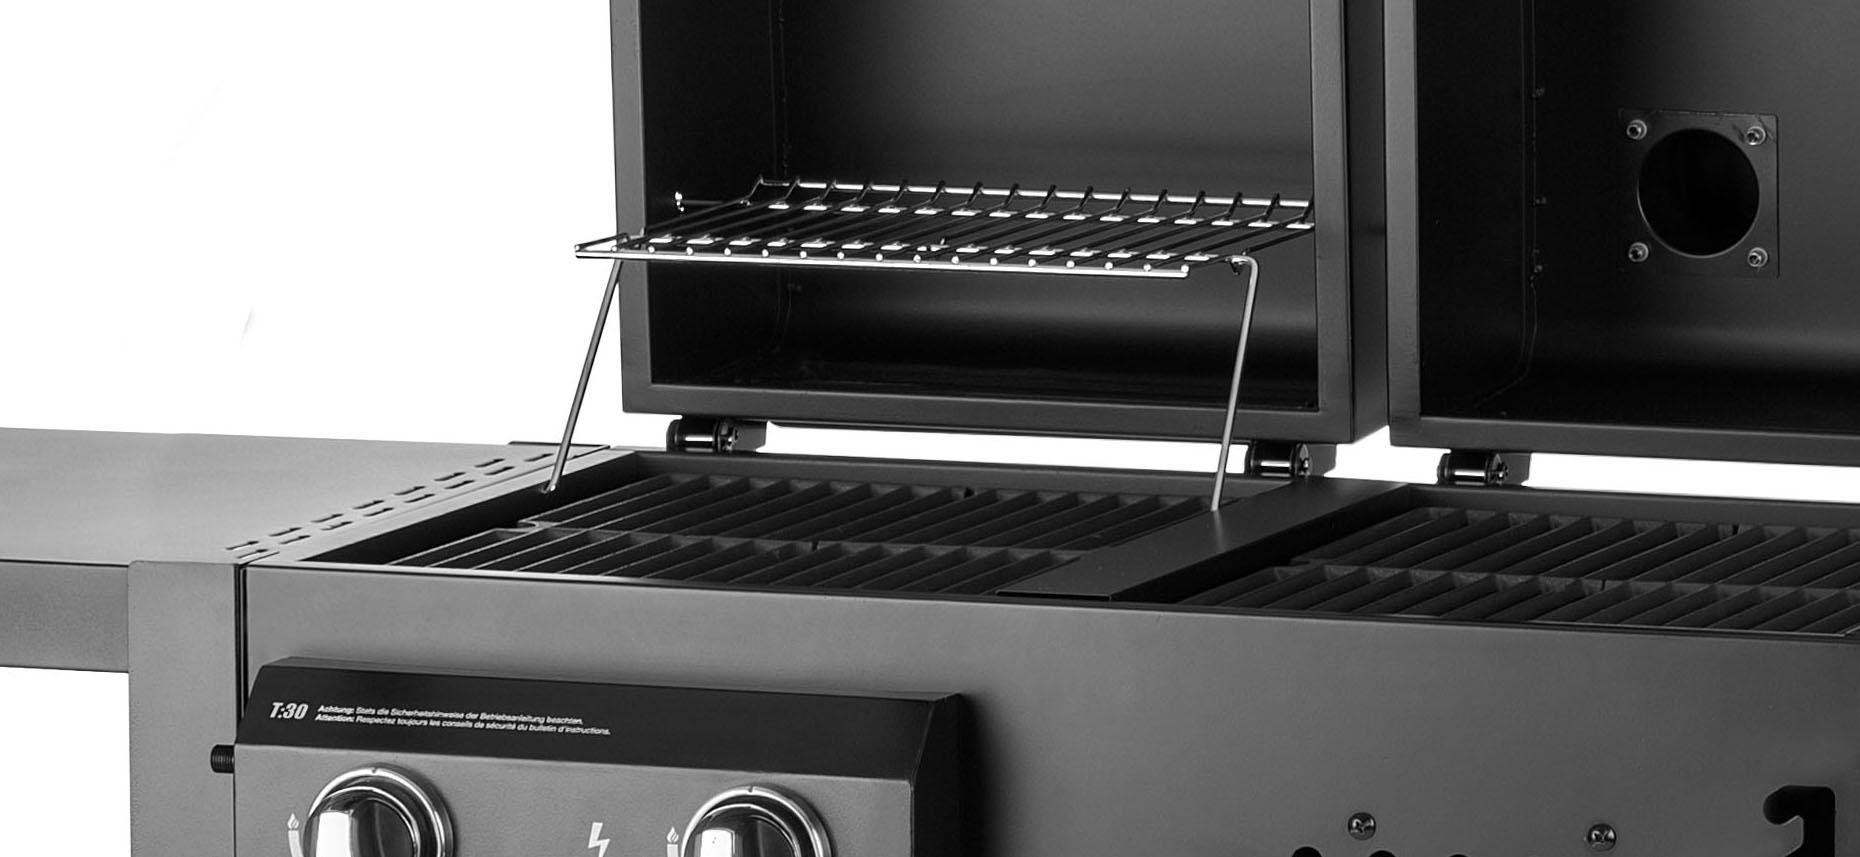 twin grill t30 top aktion kombigrill mit gas und holzkohle von chef centre ebay. Black Bedroom Furniture Sets. Home Design Ideas